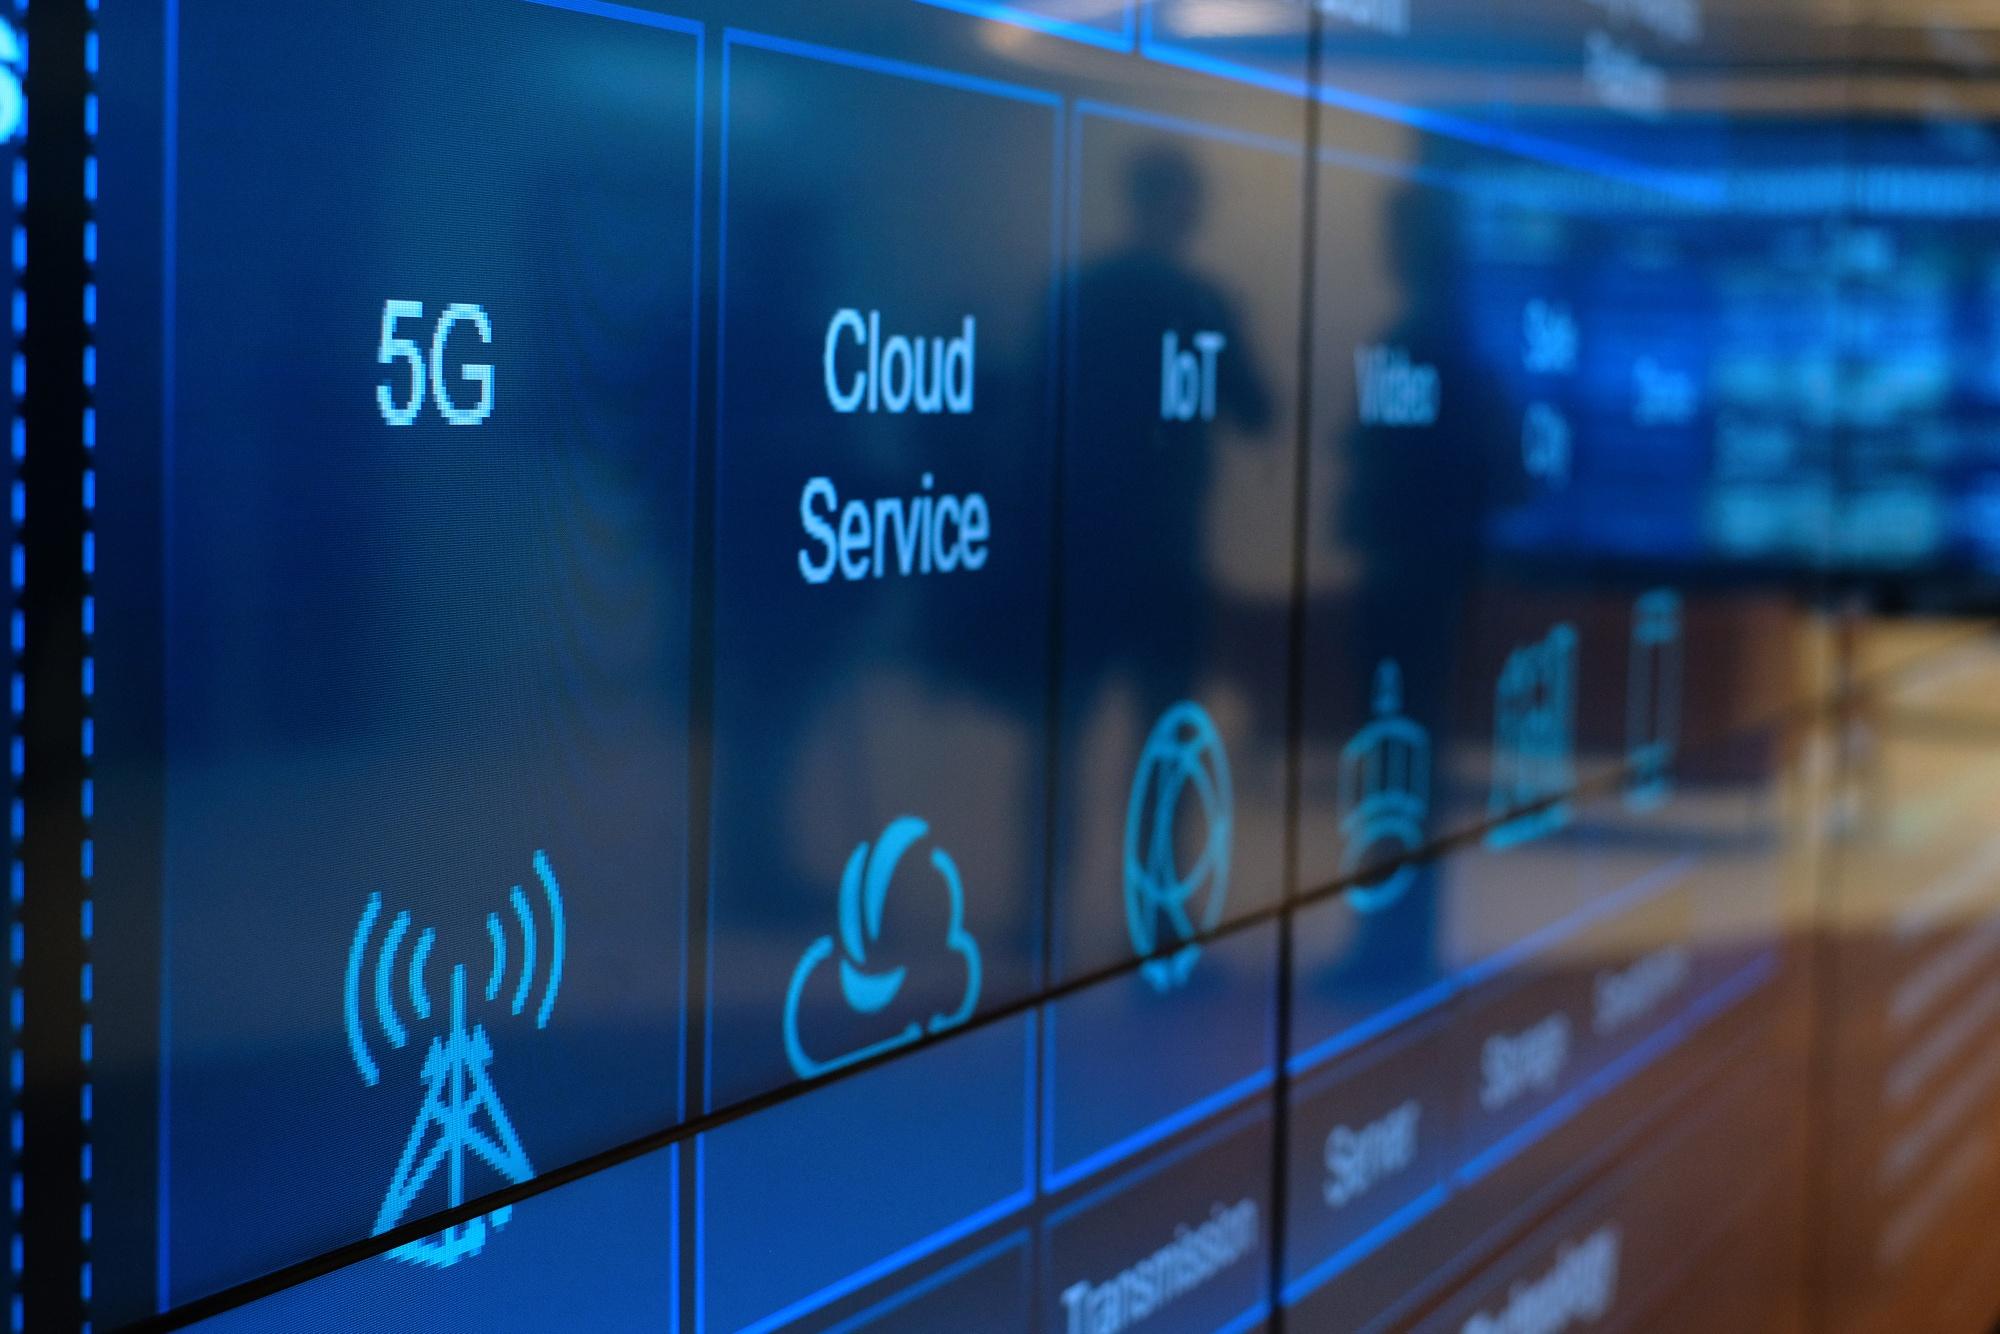 bloomberg.com - Natalia Drozdiak - EU Said to Urge Member States to Share Intel on 5G Cyber Threats